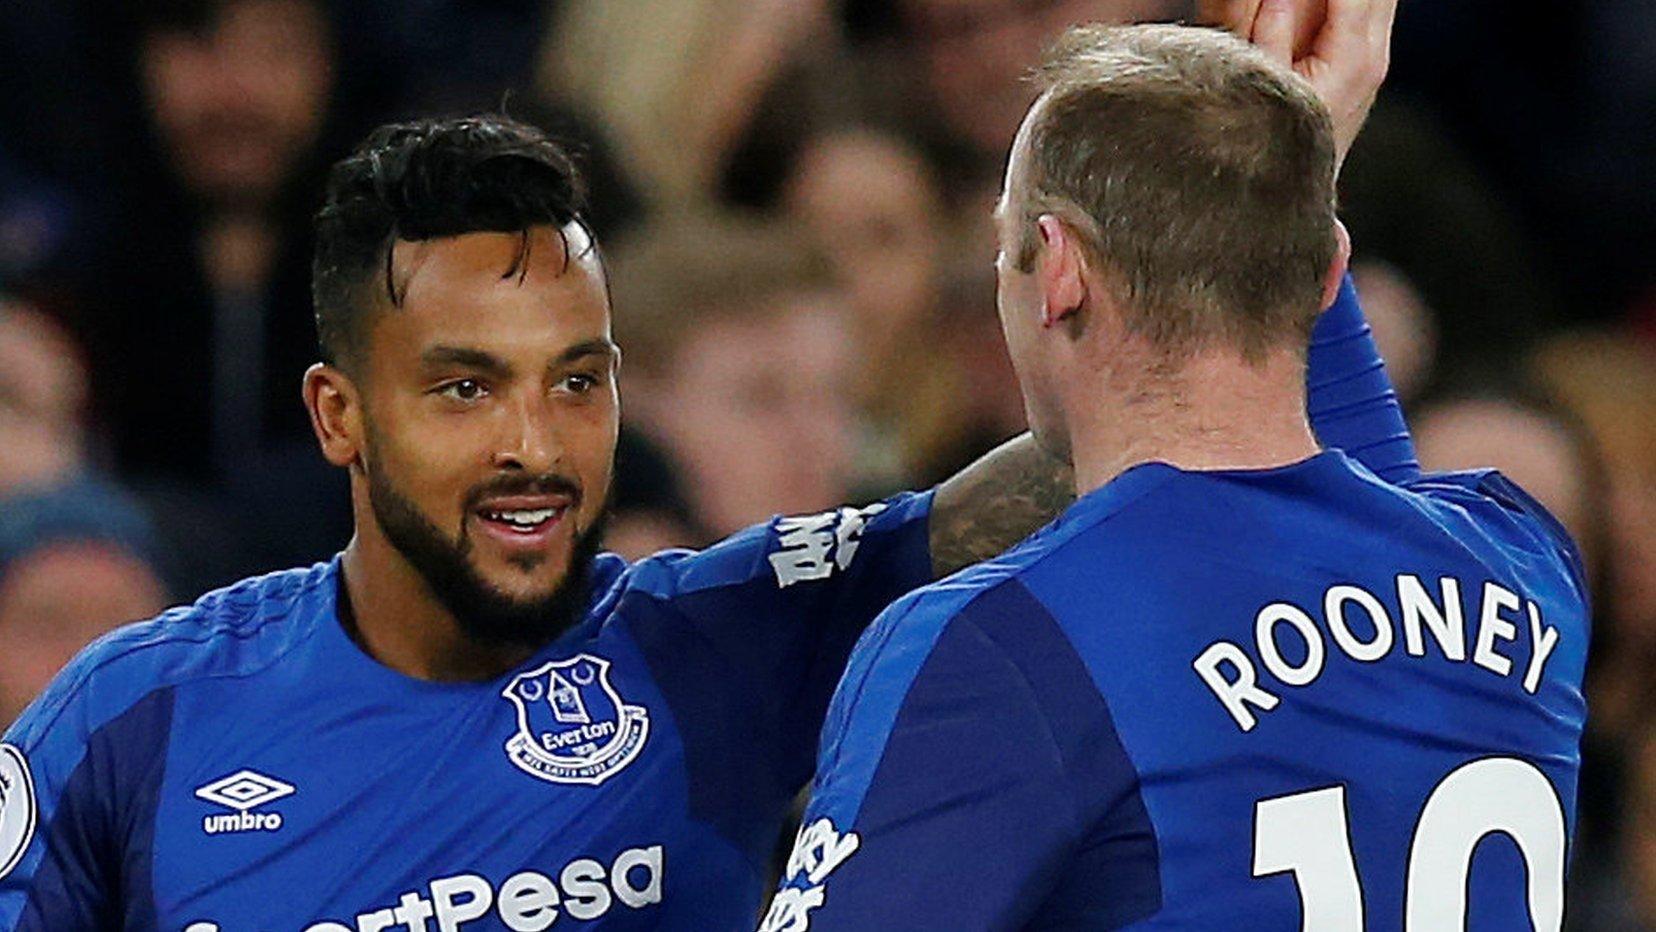 Allardyce defends Everton style in win over Newcastle